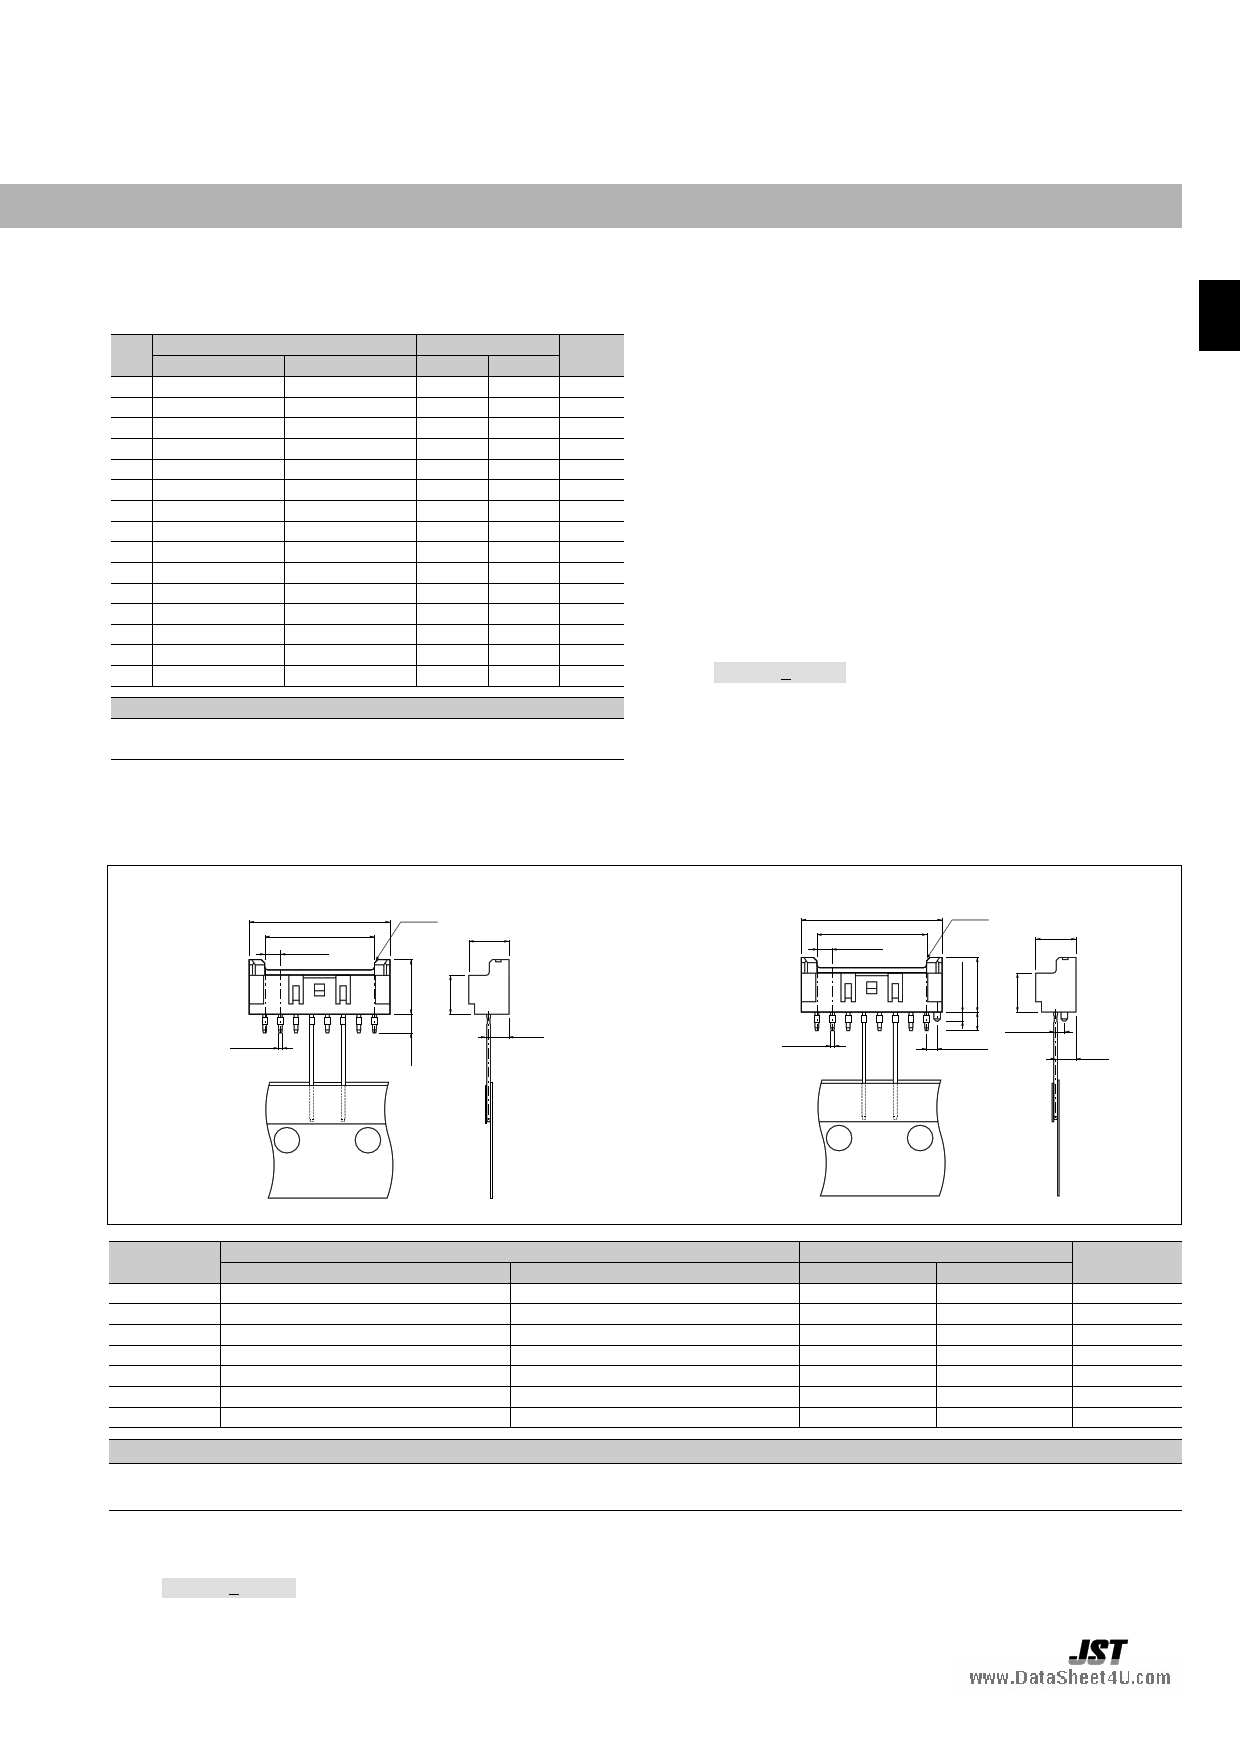 B-03B-XASK-1 pdf, arduino